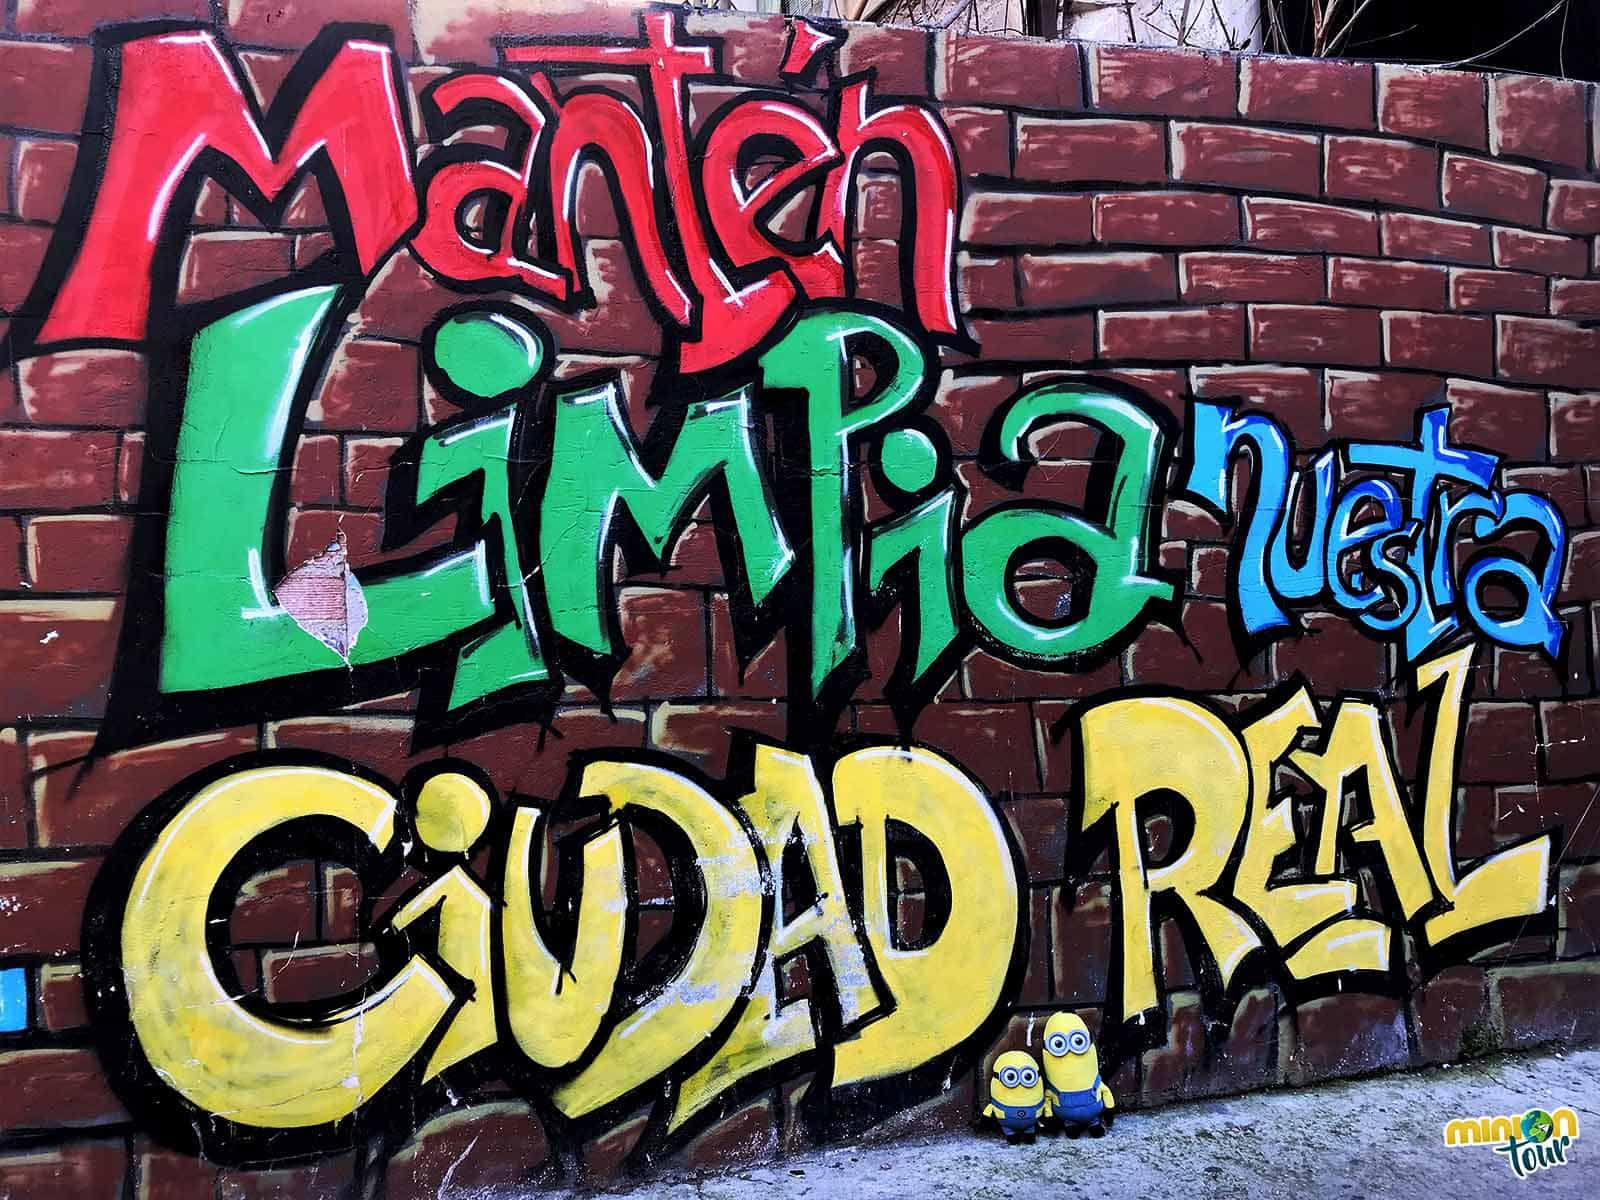 Un mural de arte urbano que nos gustó mucho